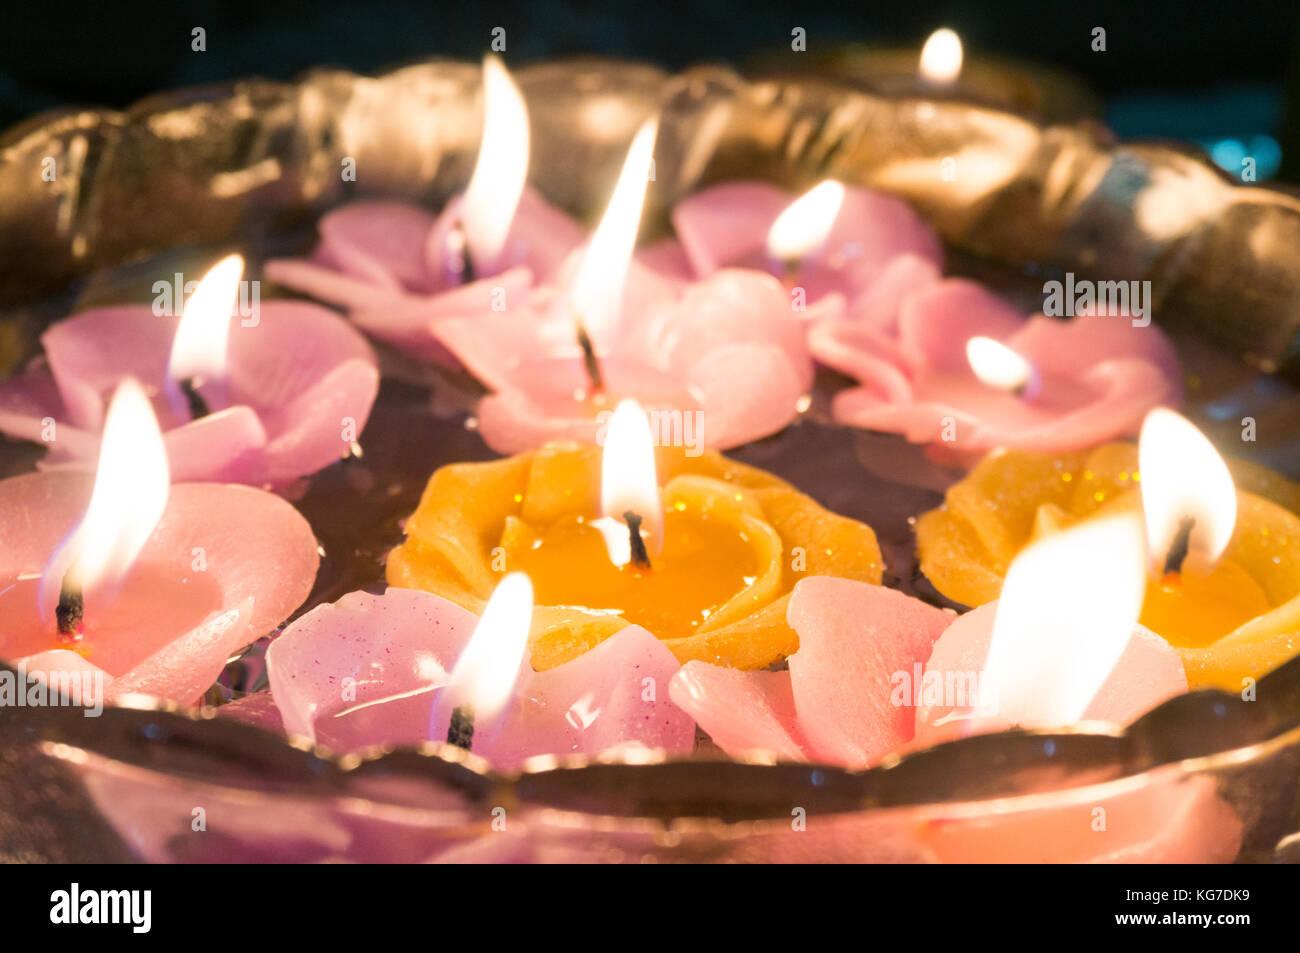 india floating candles stockfotos india floating candles bilder alamy. Black Bedroom Furniture Sets. Home Design Ideas